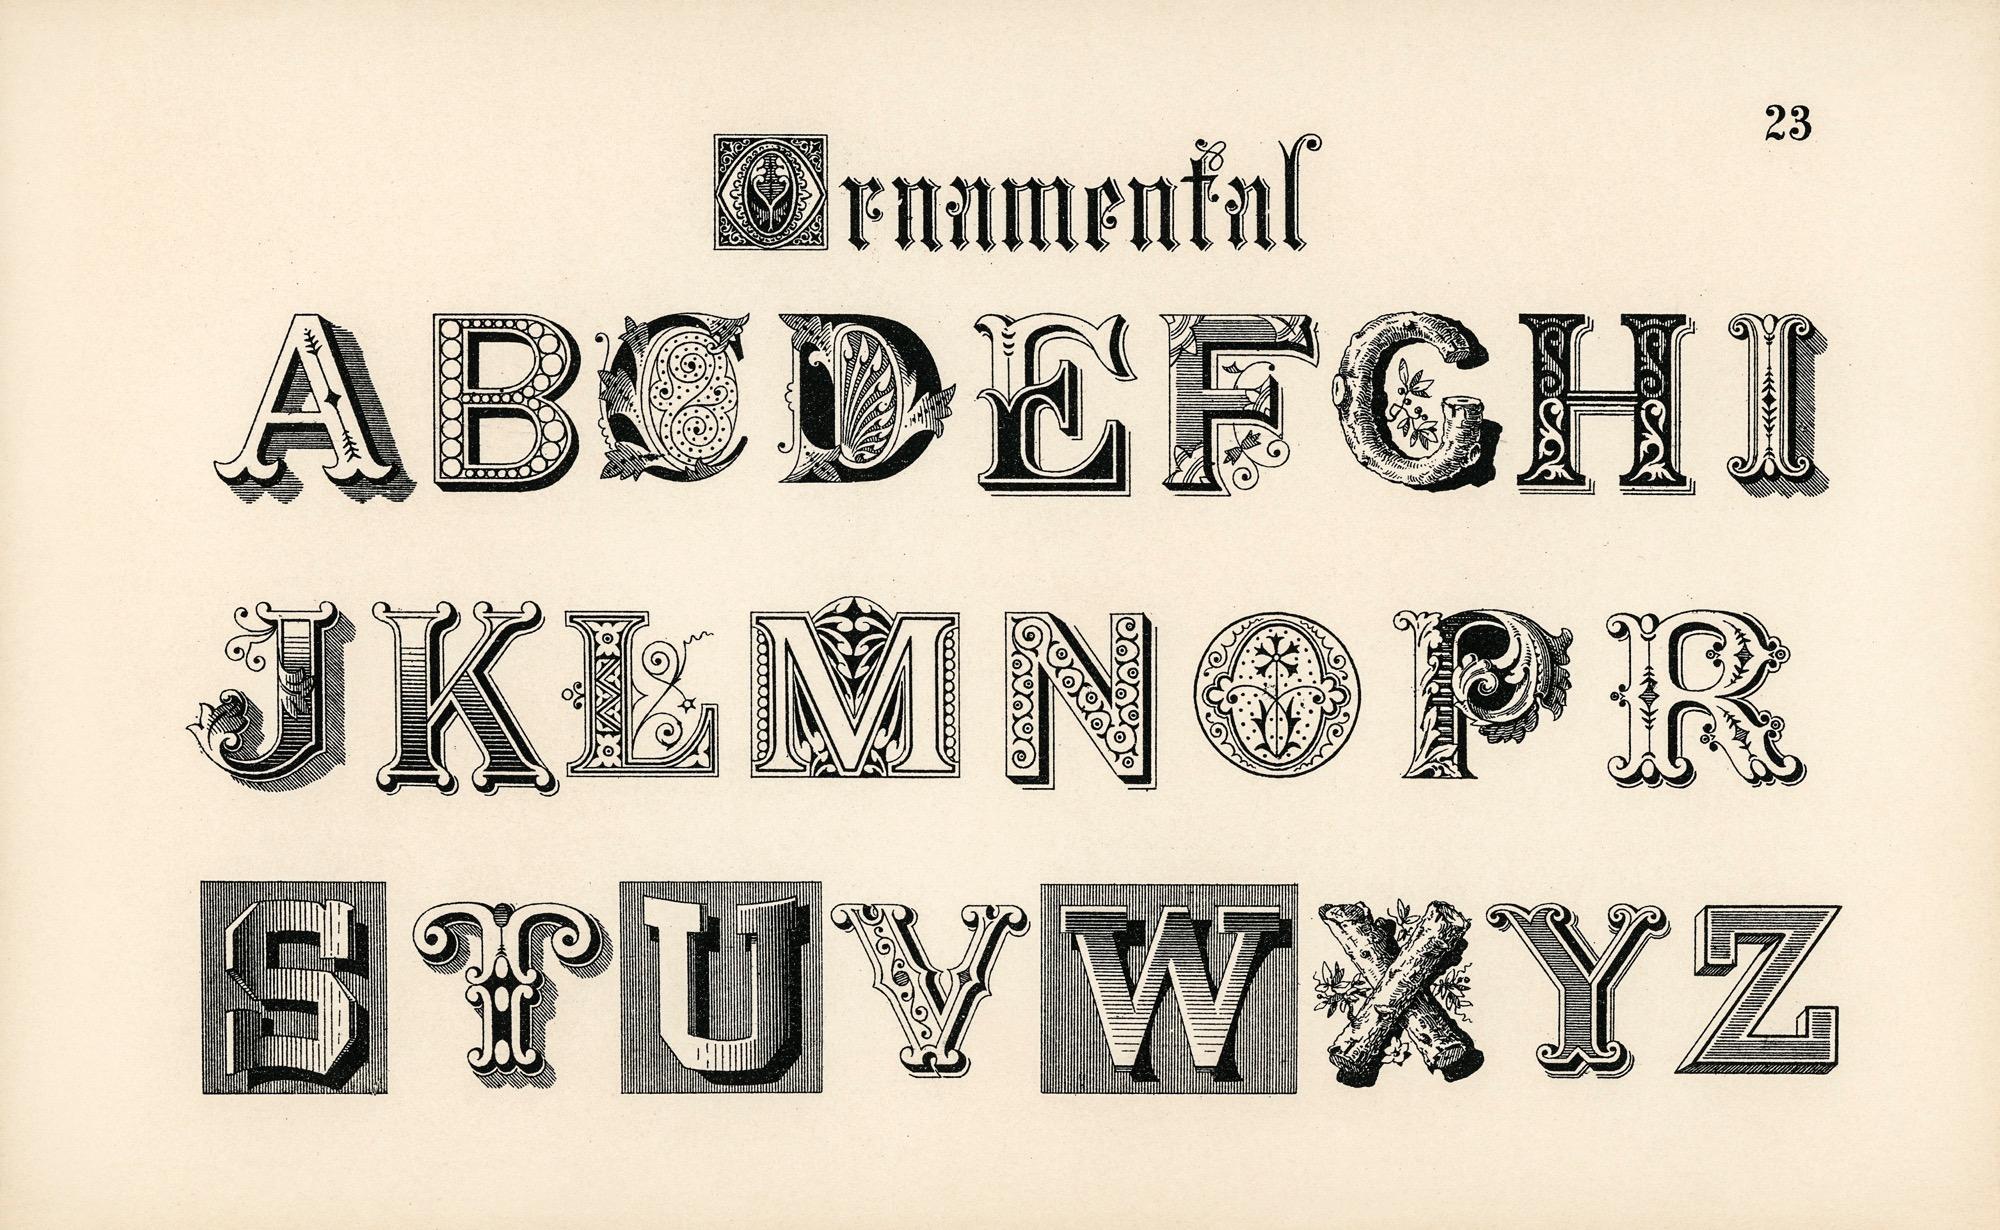 Tesori d'archivio: gli alfabeti ornamentali di Hermann Esser